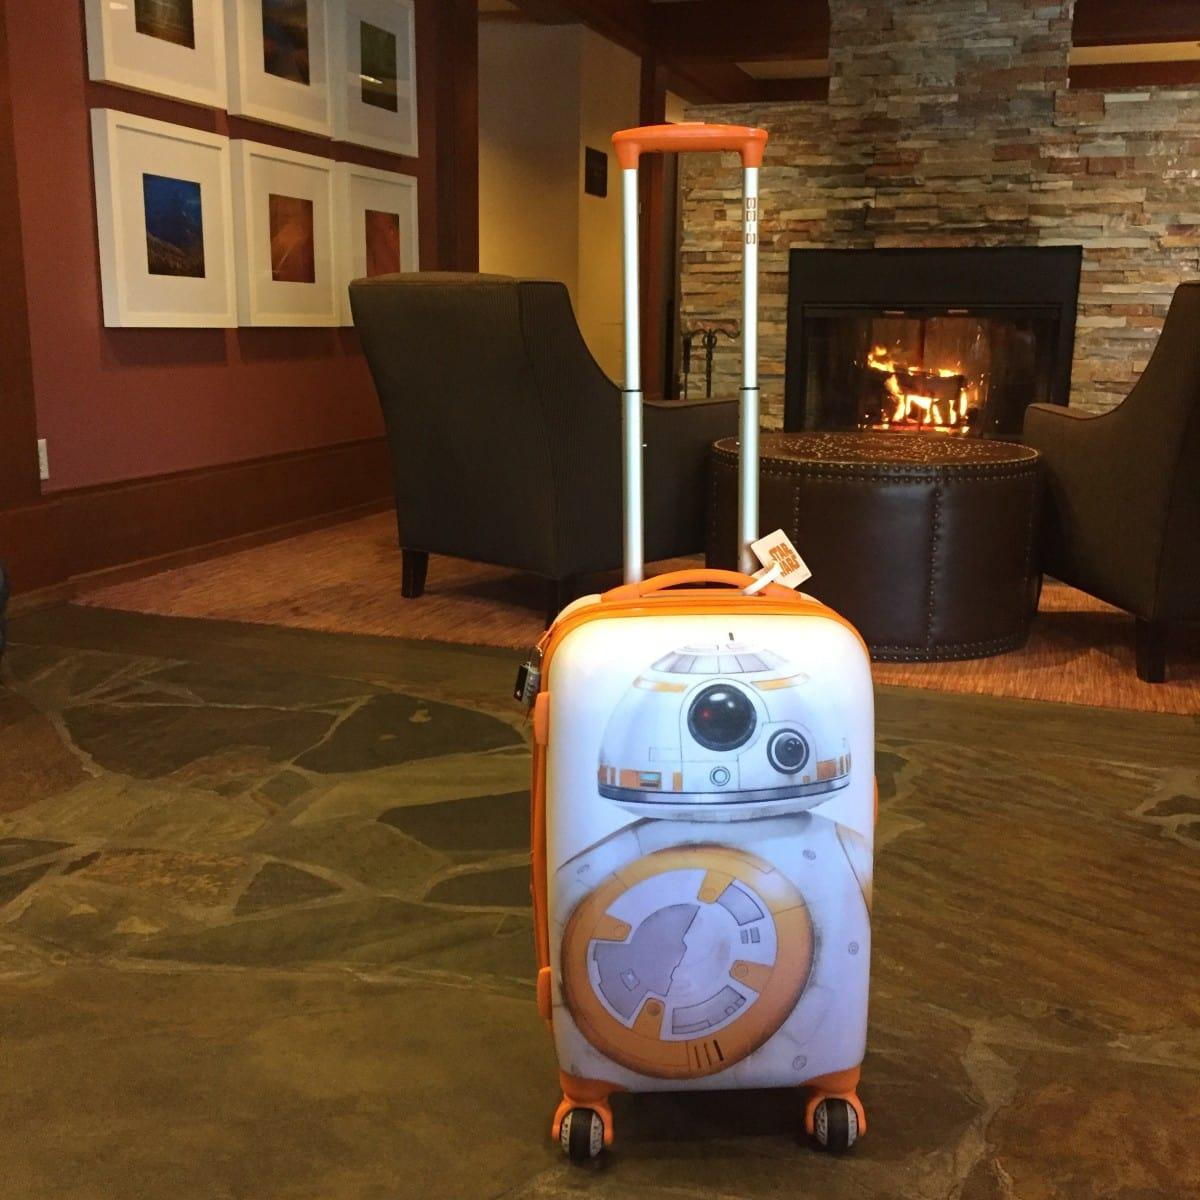 BB8 visits the Salish Lodge and Spa